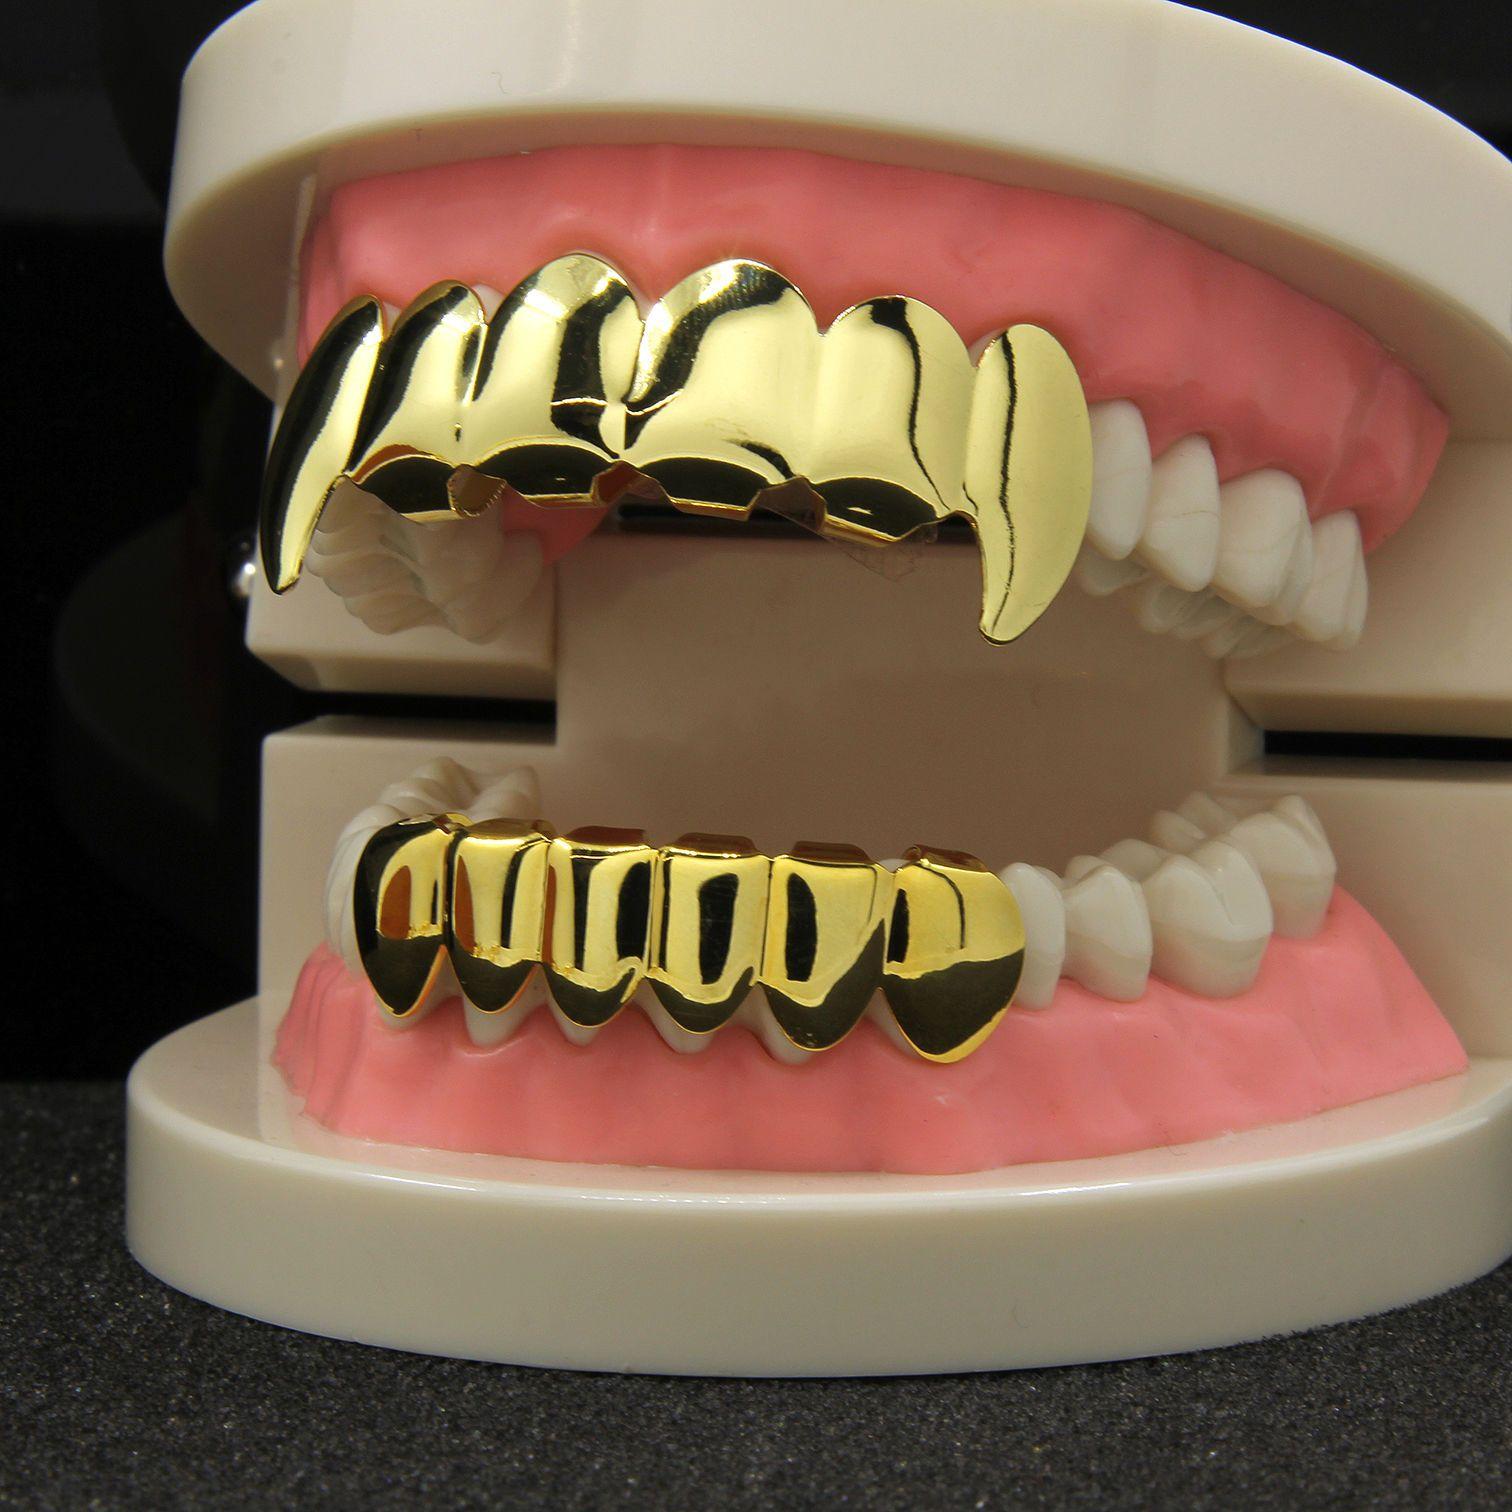 2 Pairs 18k Gold Crystal Teeth Grills Mouth Caps Teeth Hip Hop Dental Grills